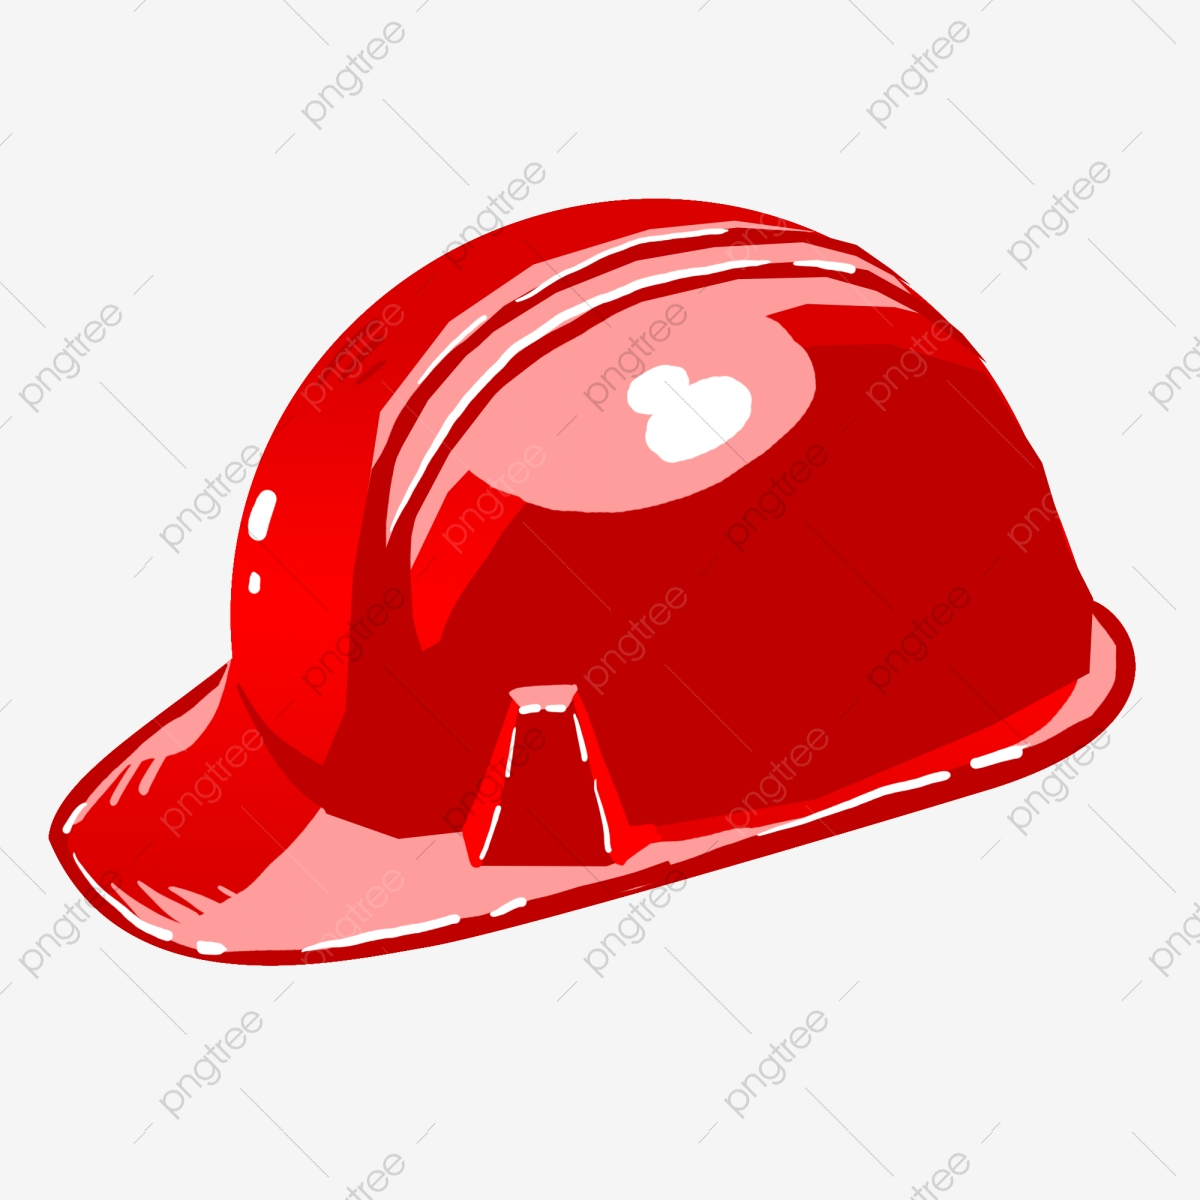 Red Hard Hat Sturdy Helmet Beautiful Hard Hat Exquisite Hard